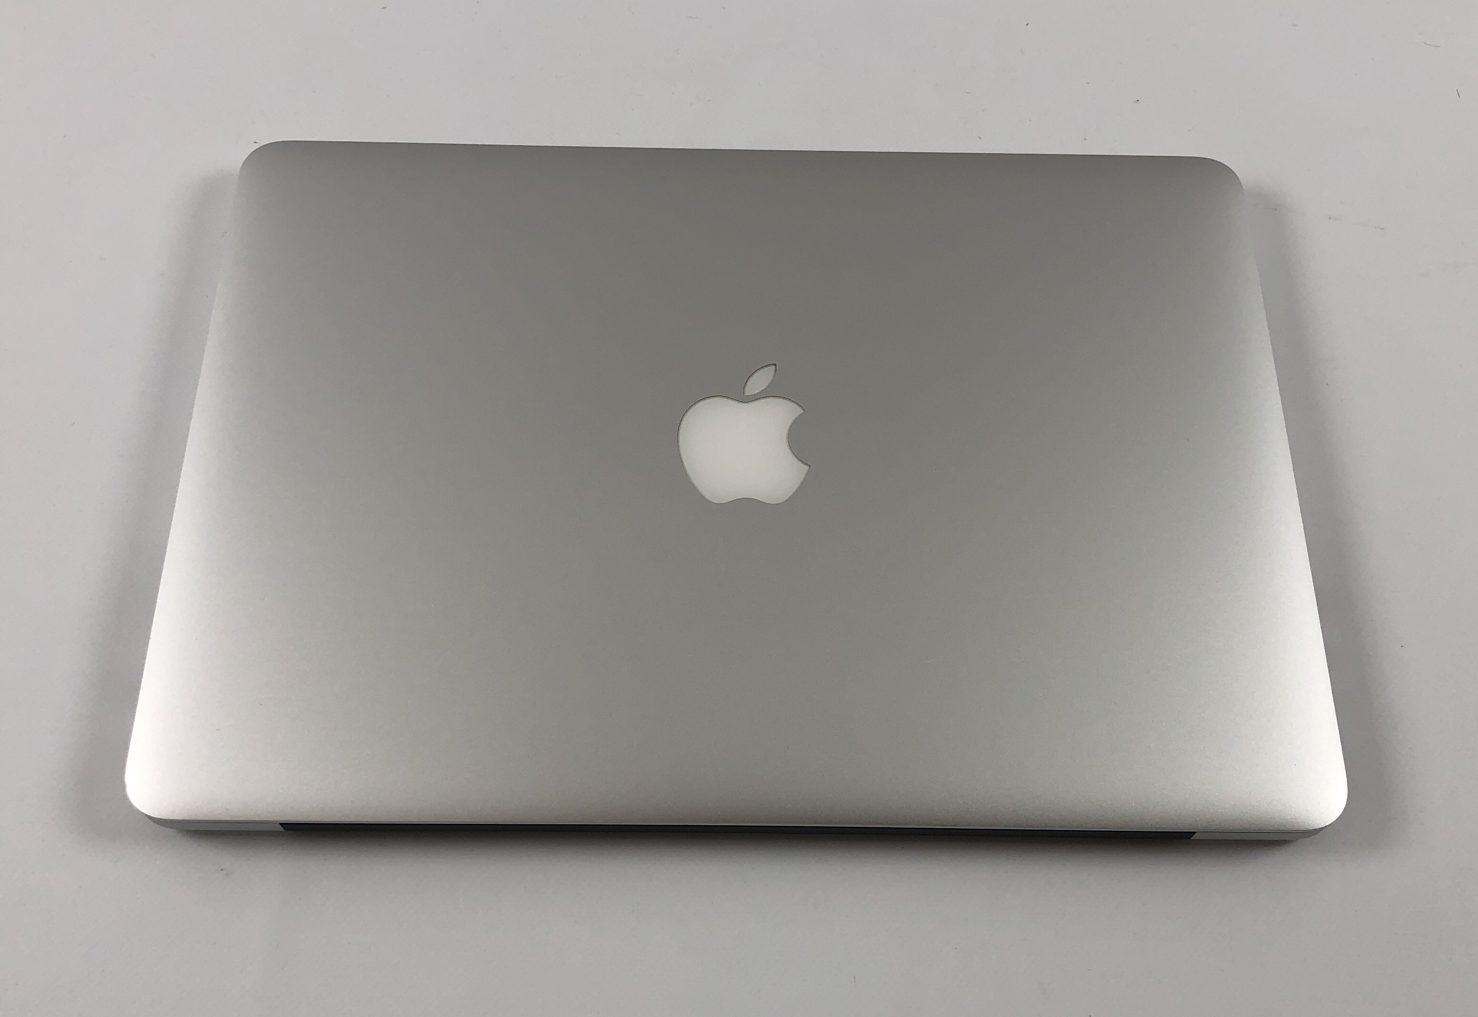 "MacBook Pro Retina 13"" Early 2015 (Intel Core i5 2.7 GHz 8 GB RAM 256 GB SSD), Intel Core i5 2.7 GHz, 8 GB RAM, 256 GB SSD, imagen 2"